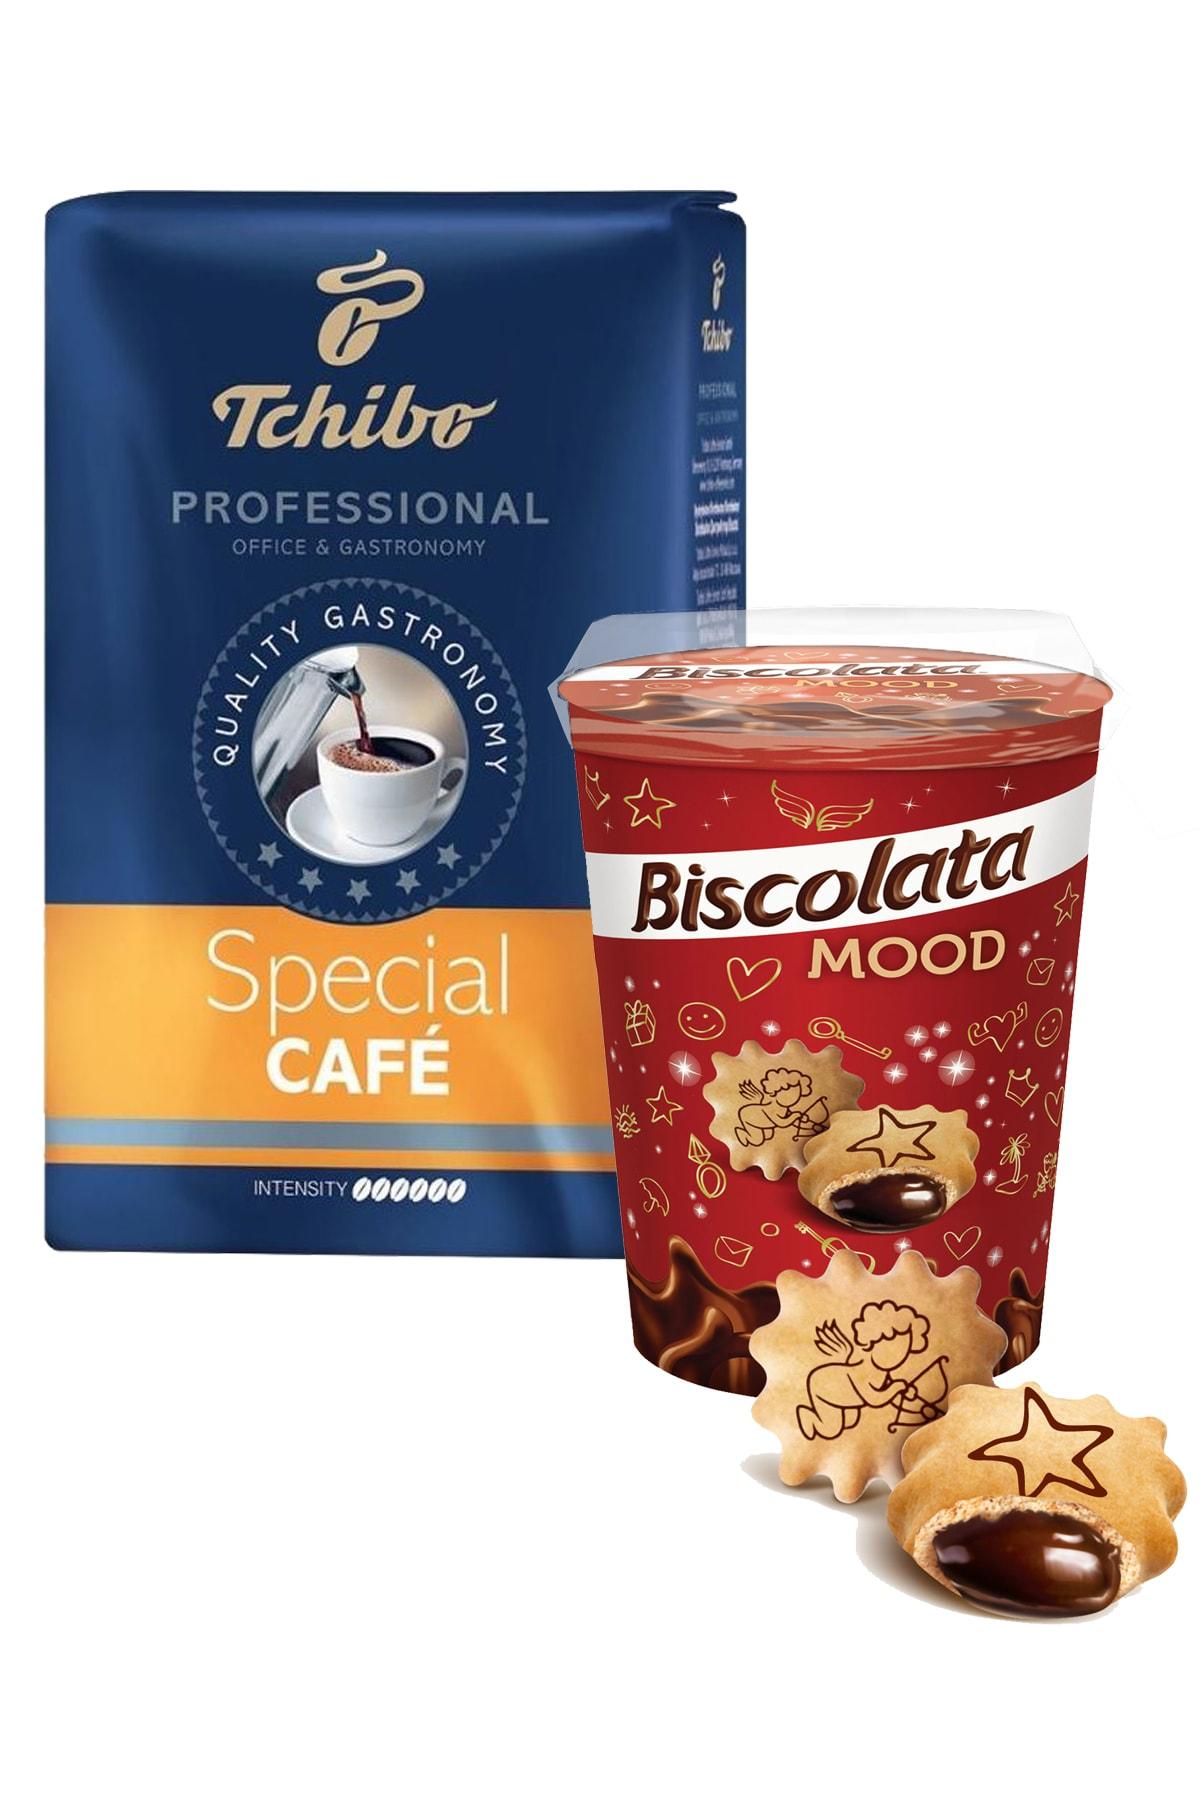 Biscolata Mood Çikolatalı - Special Filtre Kahve Keyfi